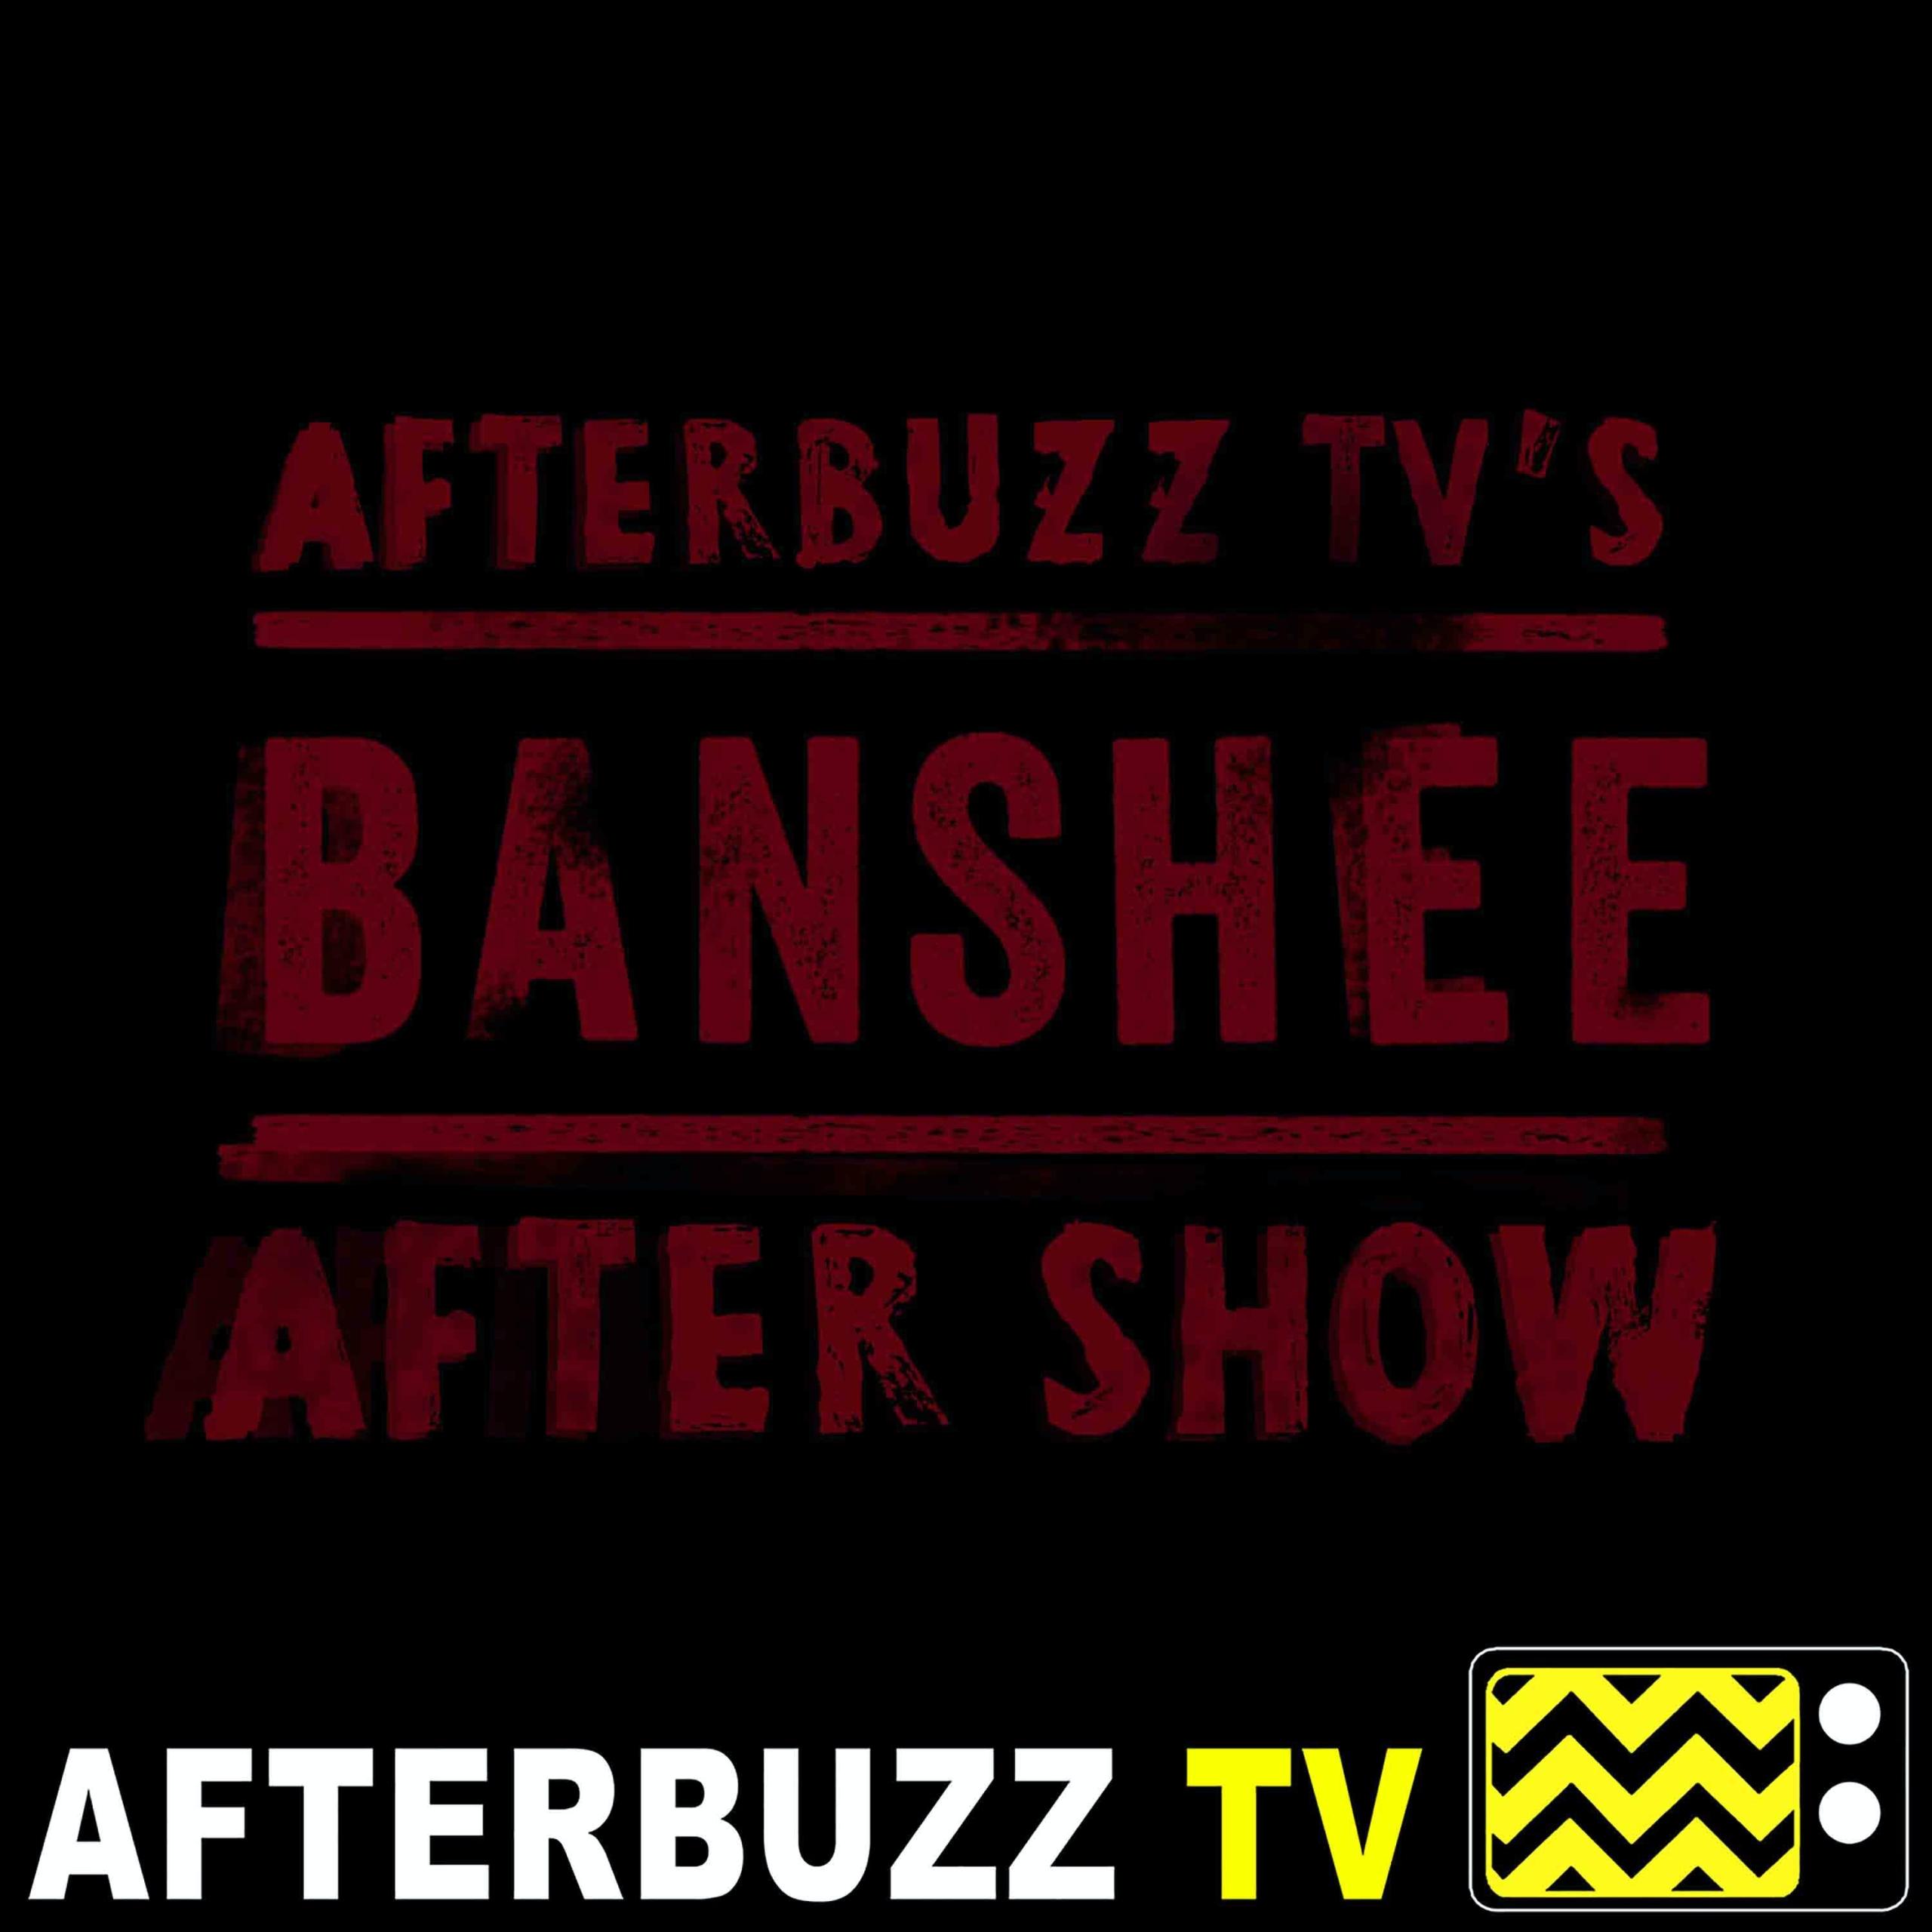 The Banshee Podcast